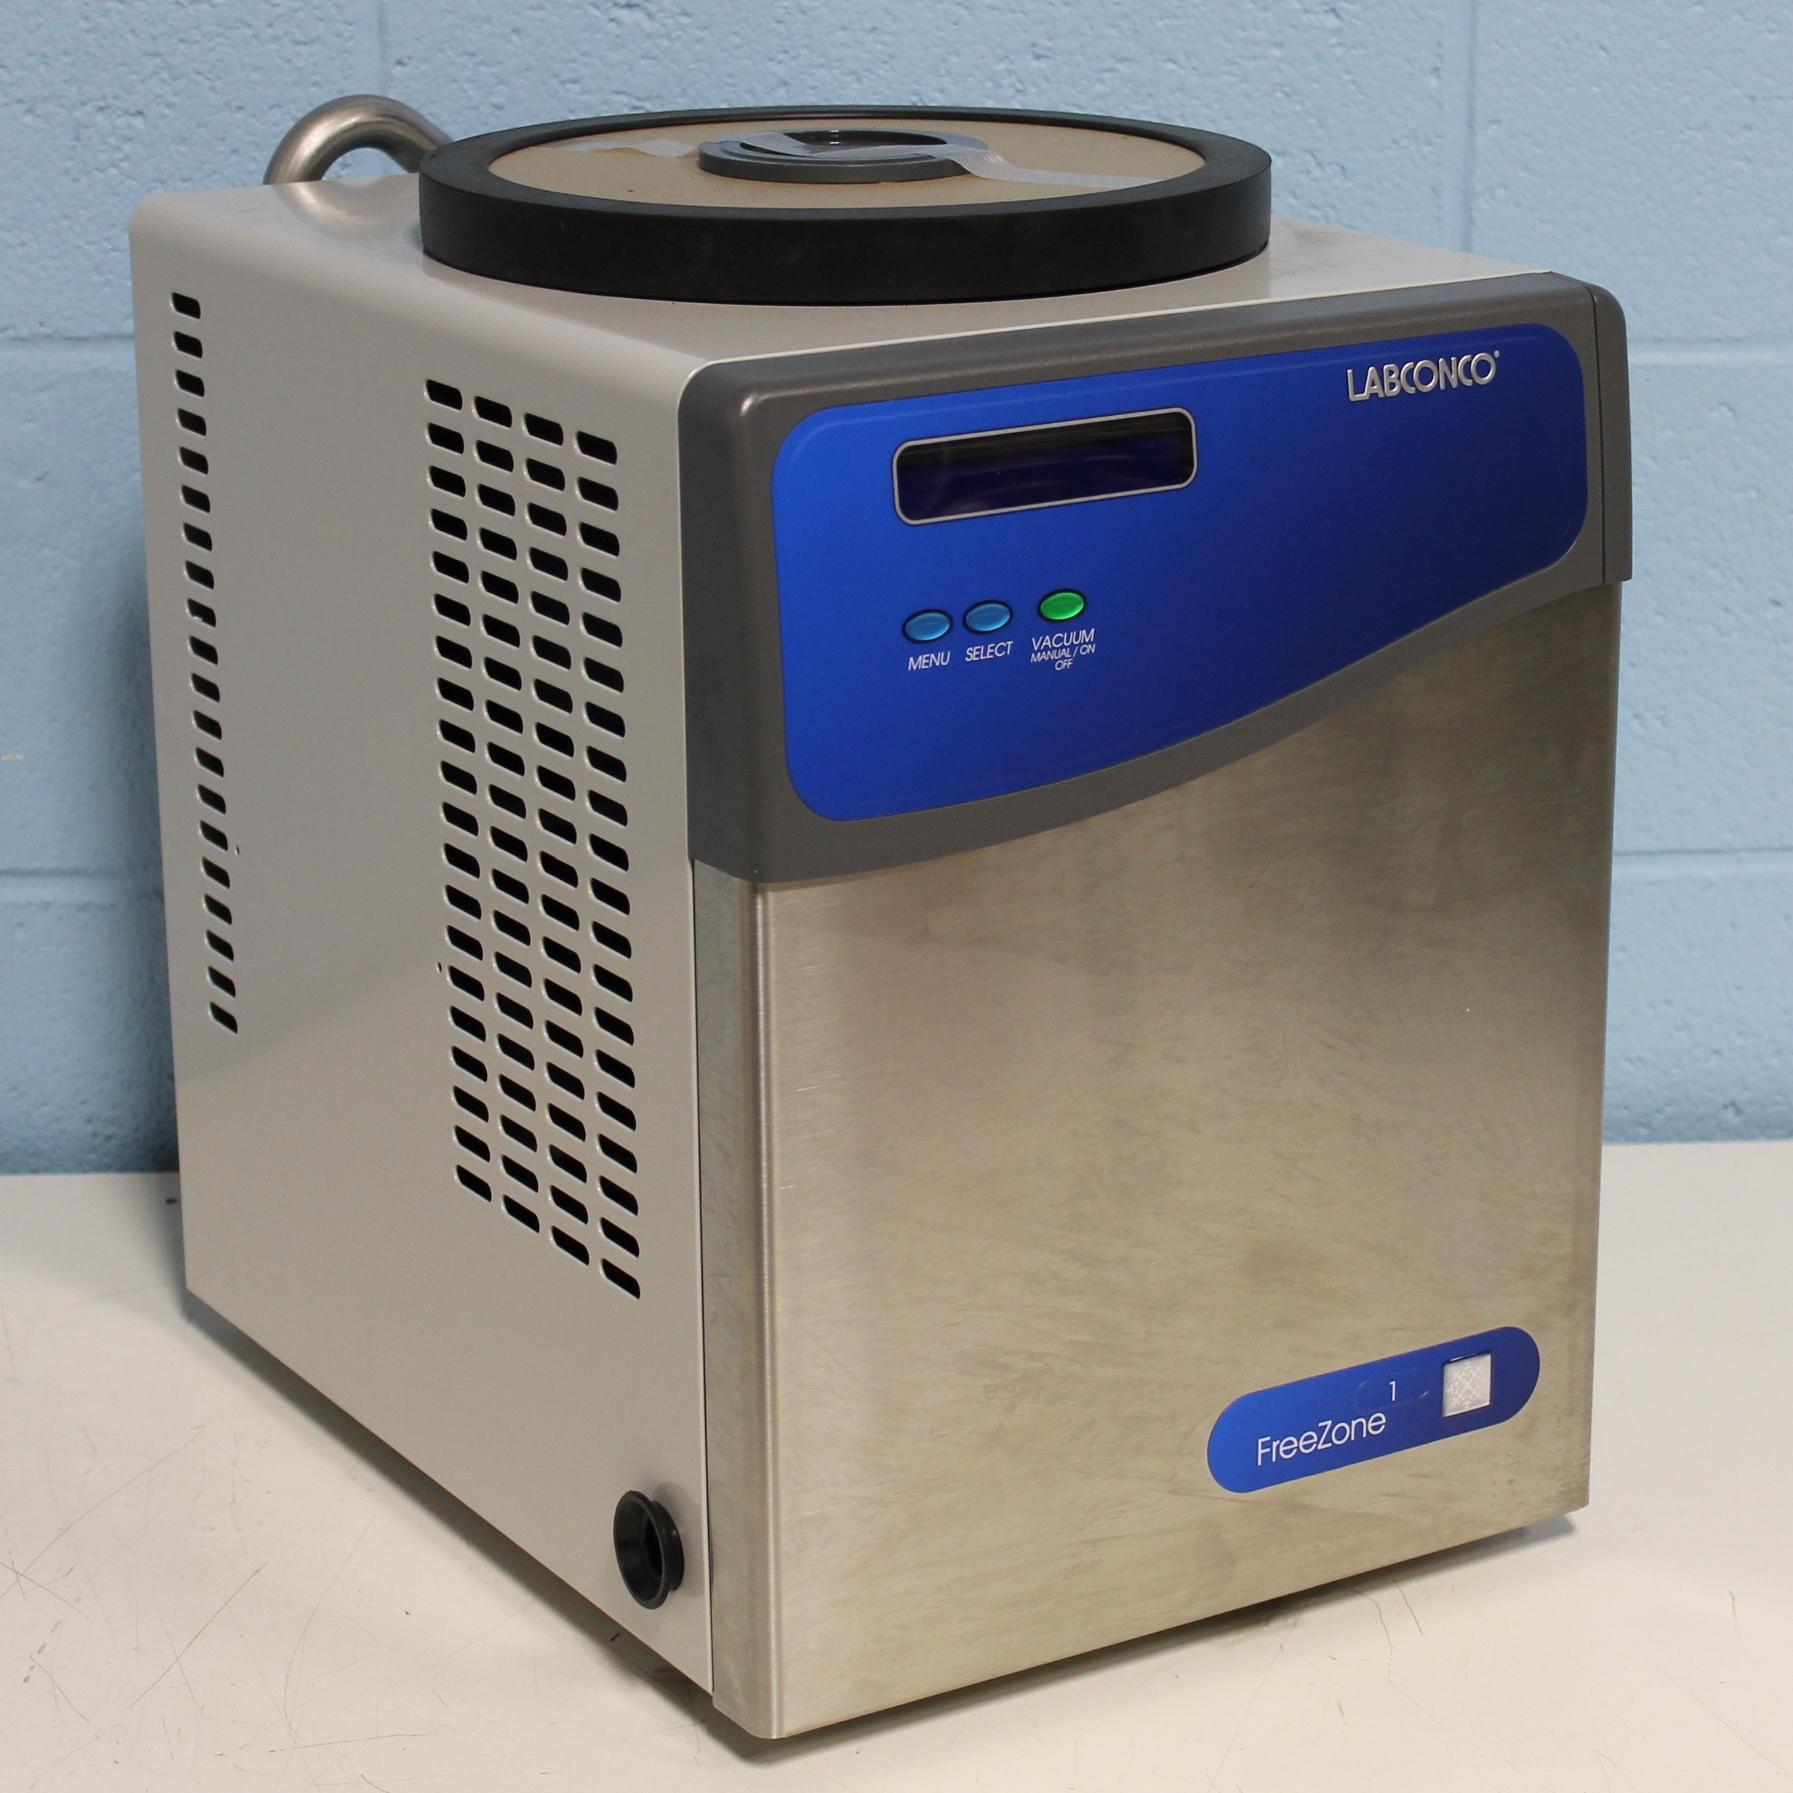 Labconco Freeze Dryer manual